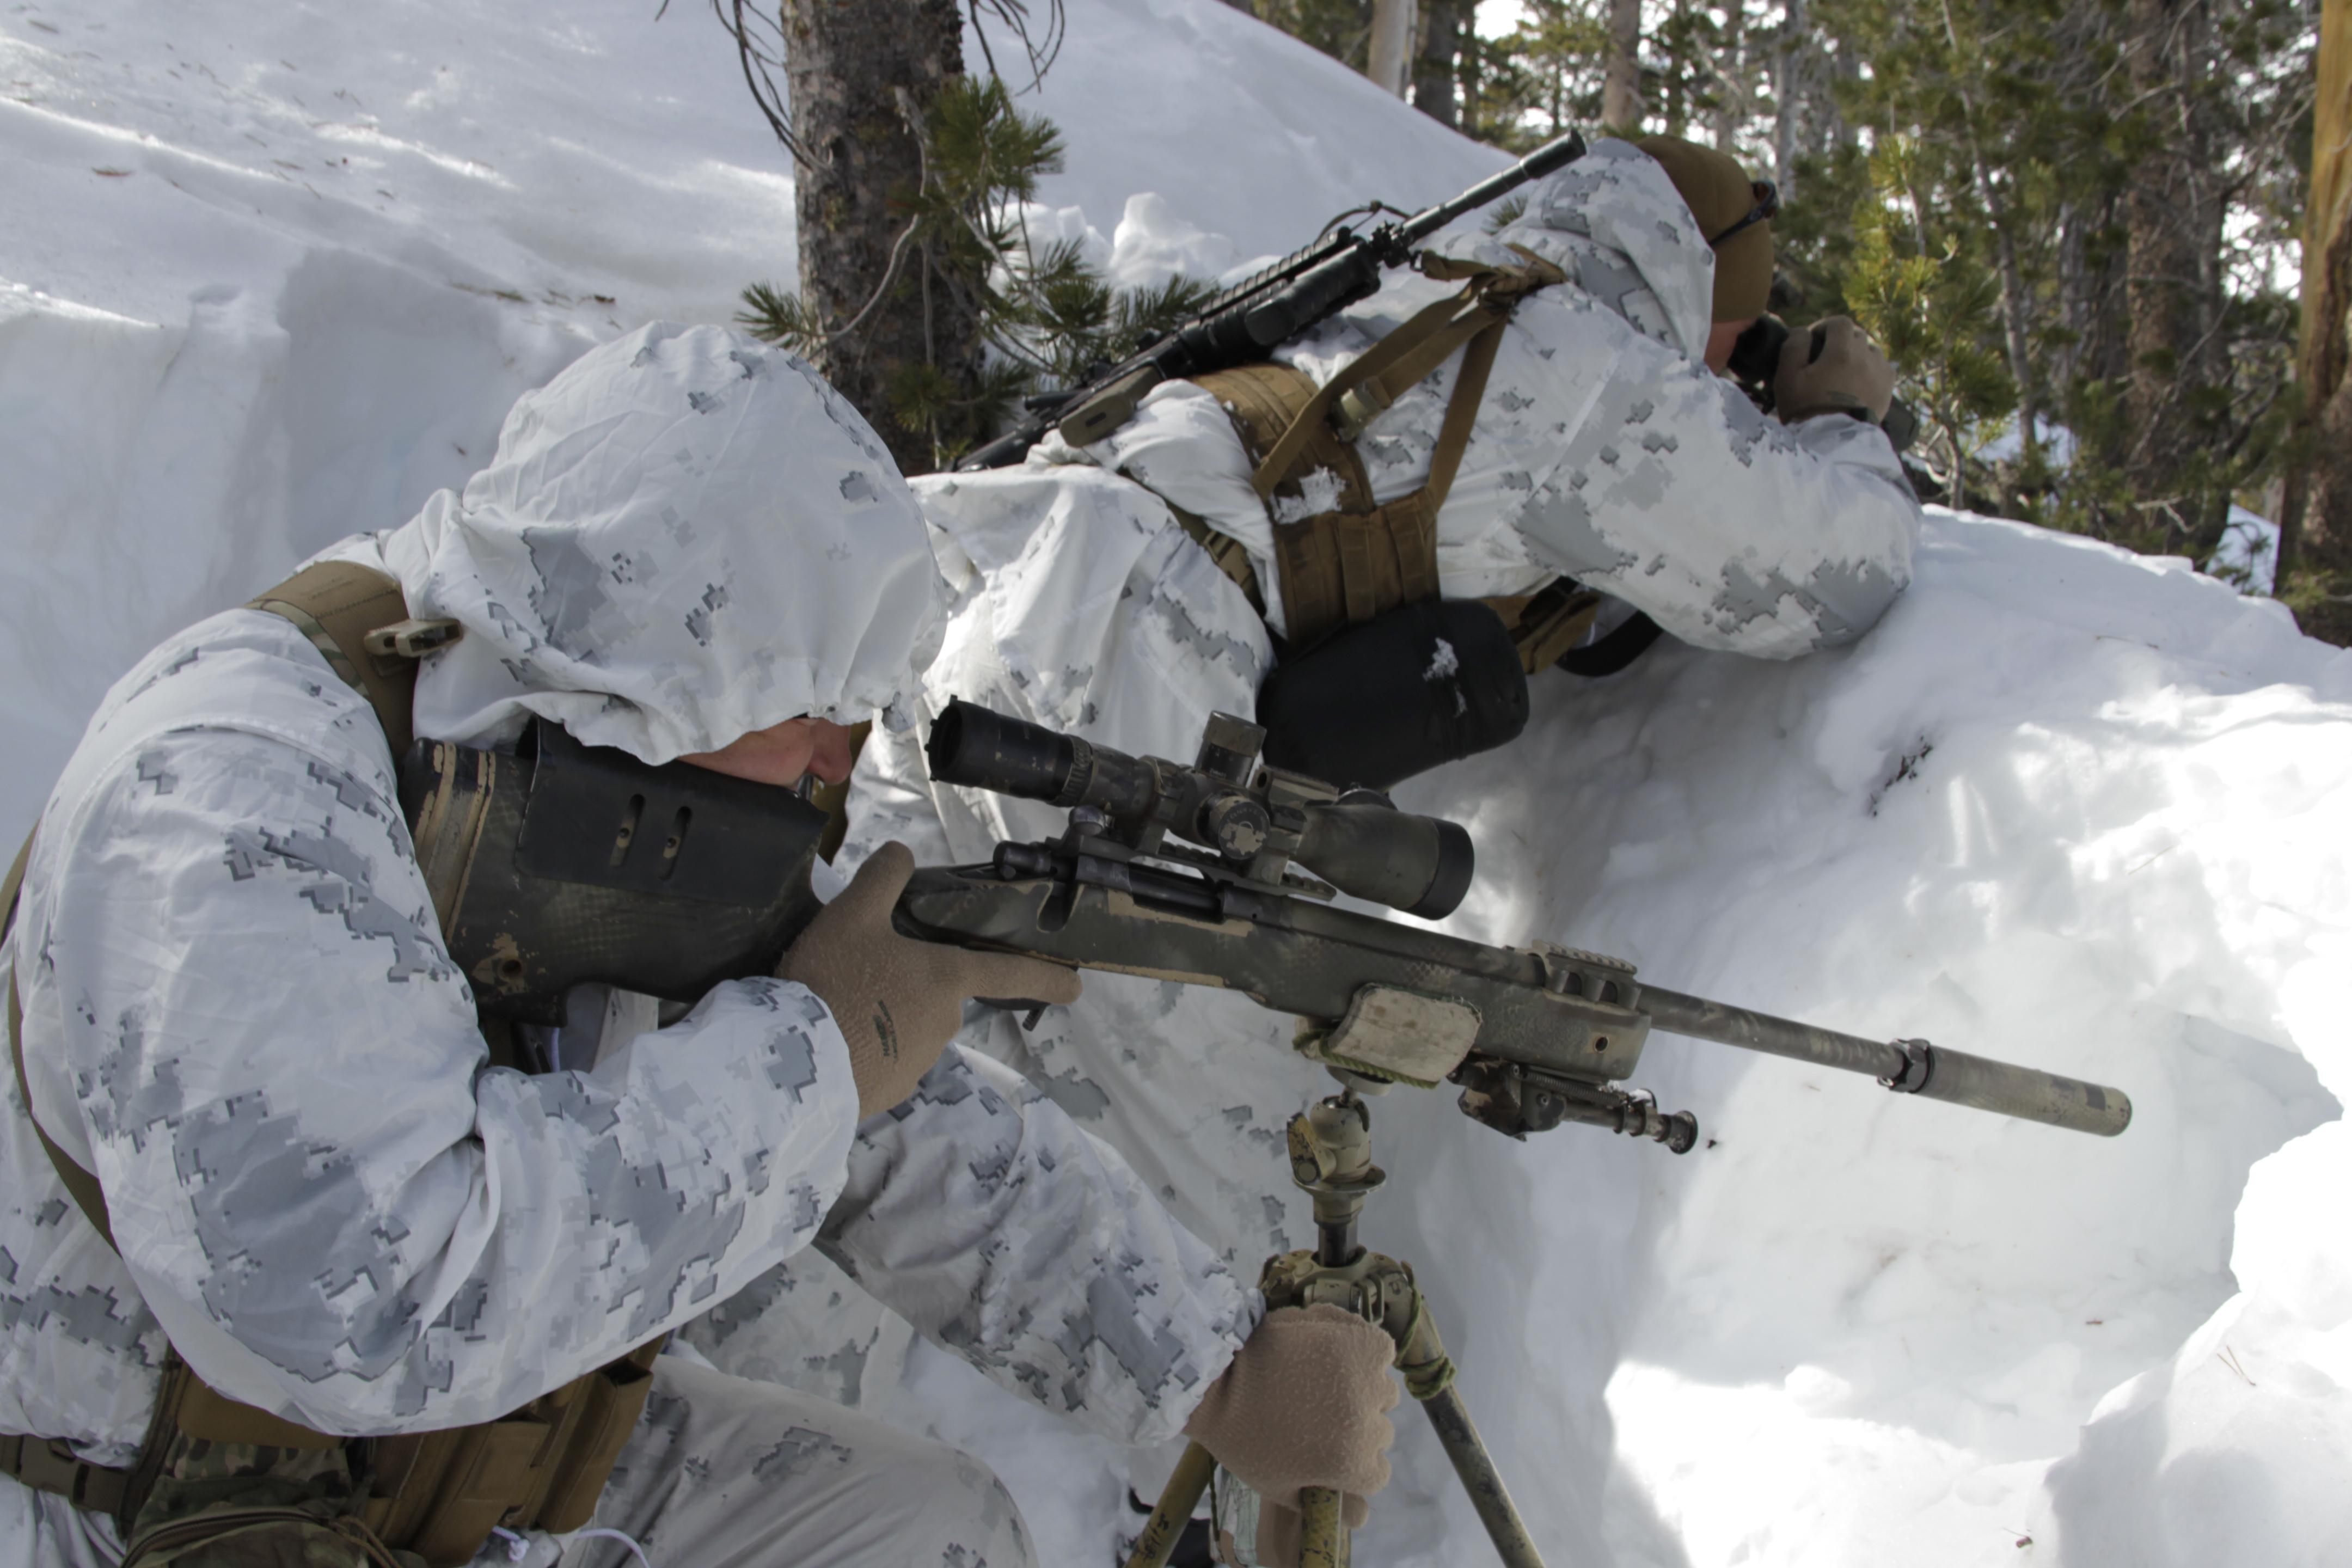 File:Scout sniper snow MARPAT.jpg M110 Sniper Rifle Suppressed